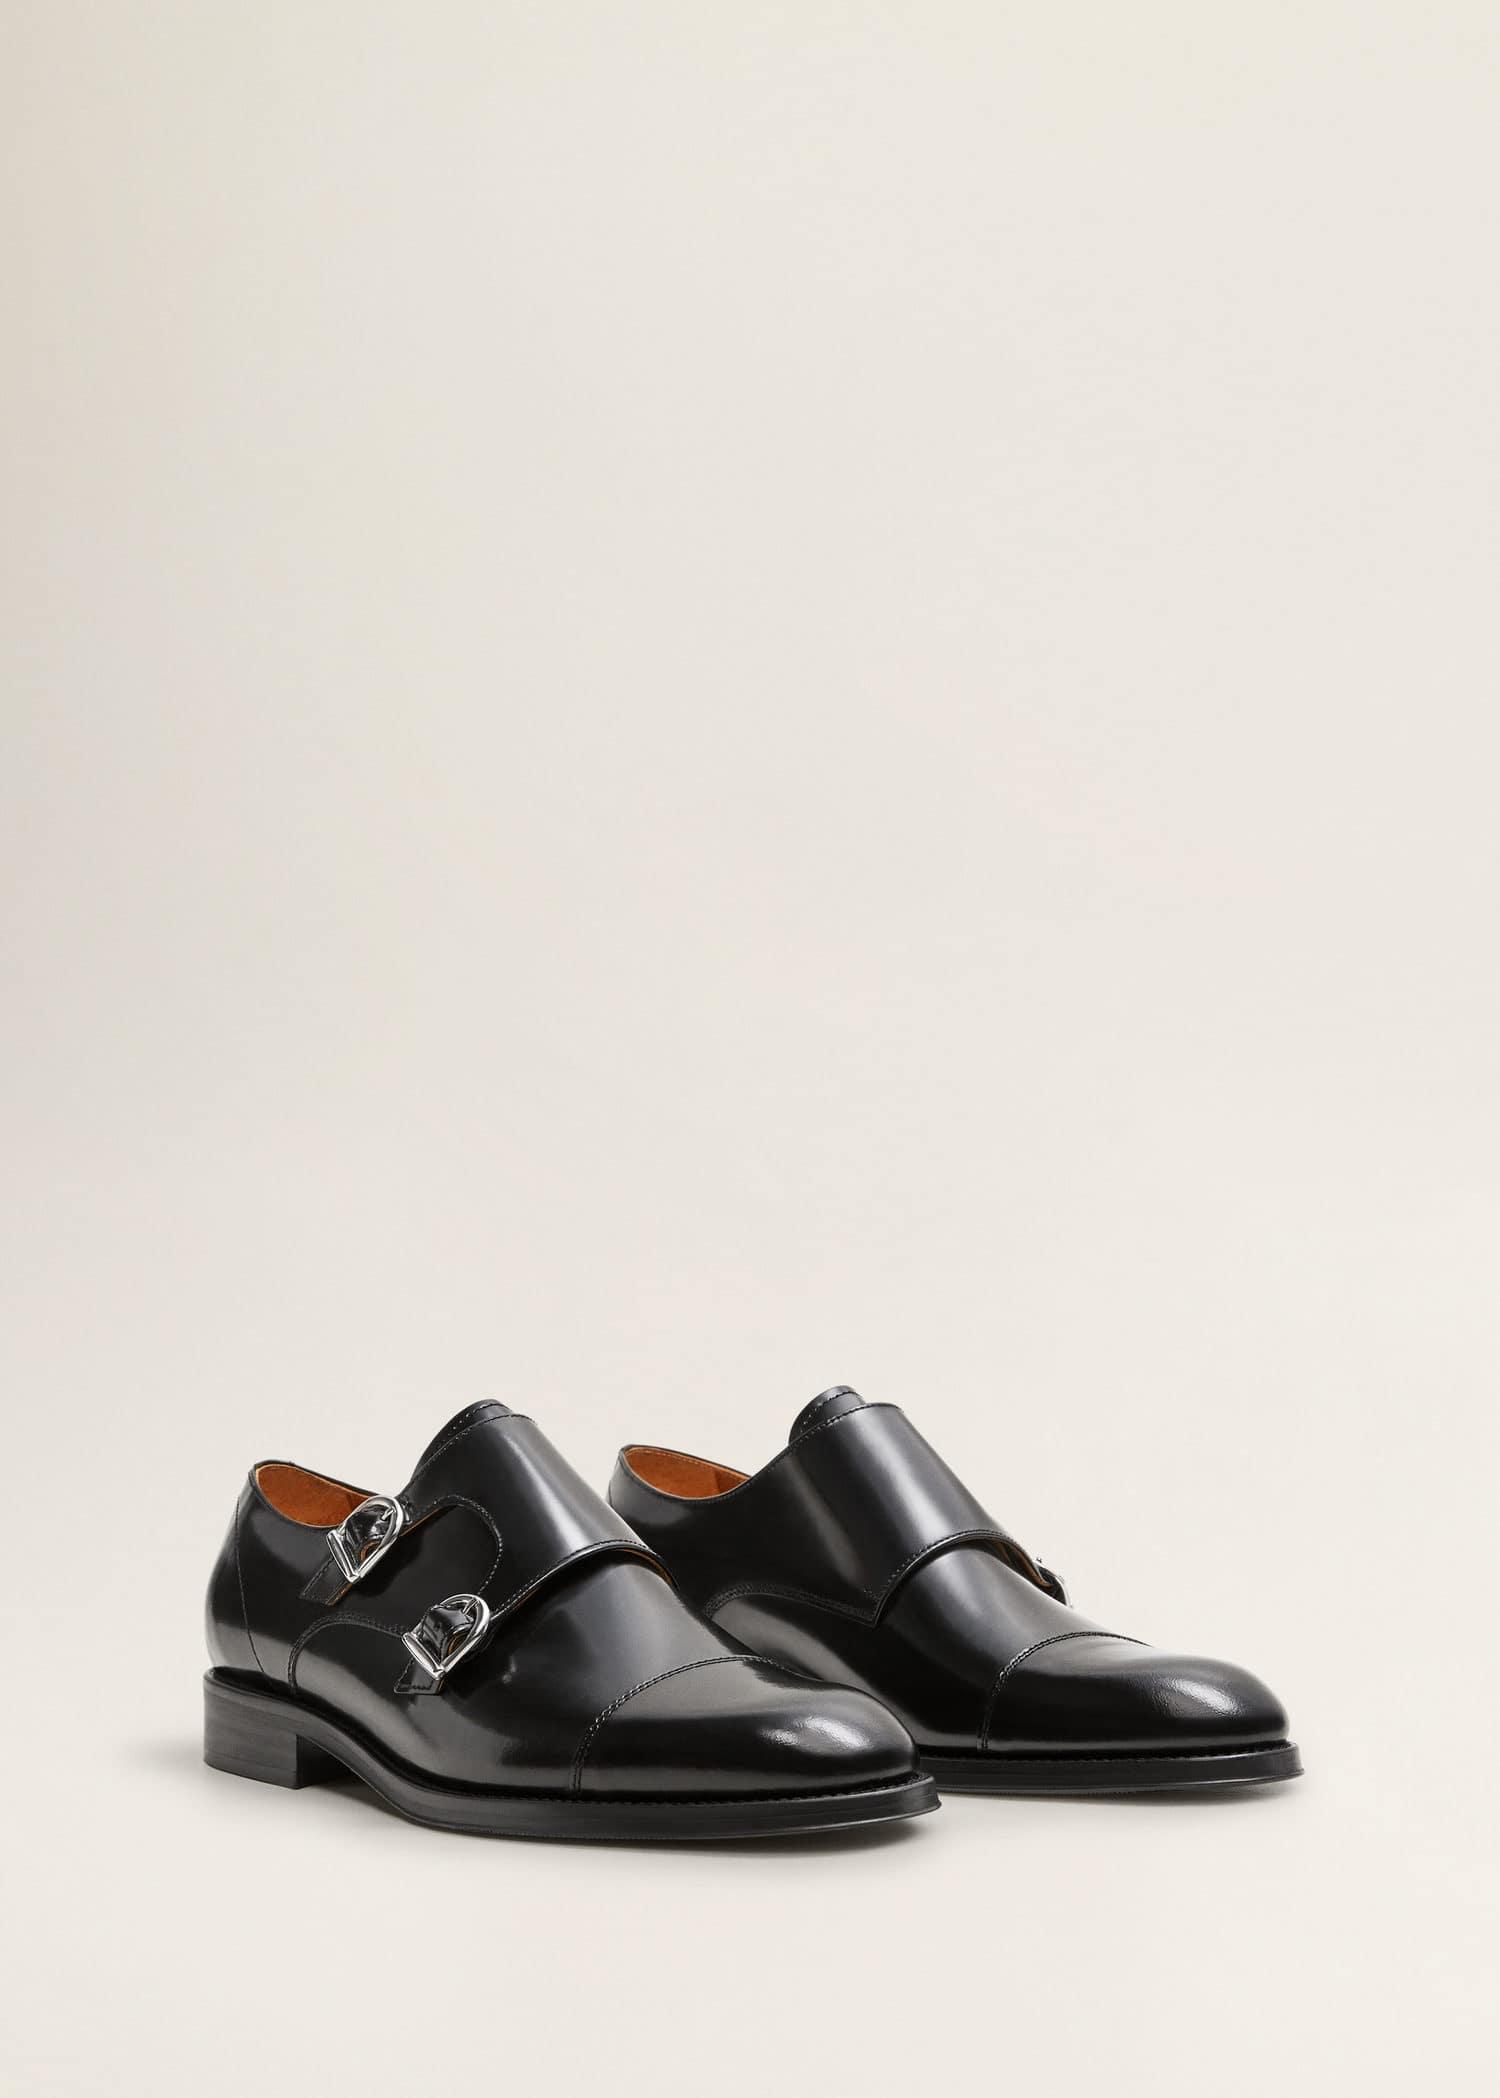 Monkstrap Zapatos Monkstrap Piel Zapatos Zapatos Piel Monkstrap Piel qrqxYFC